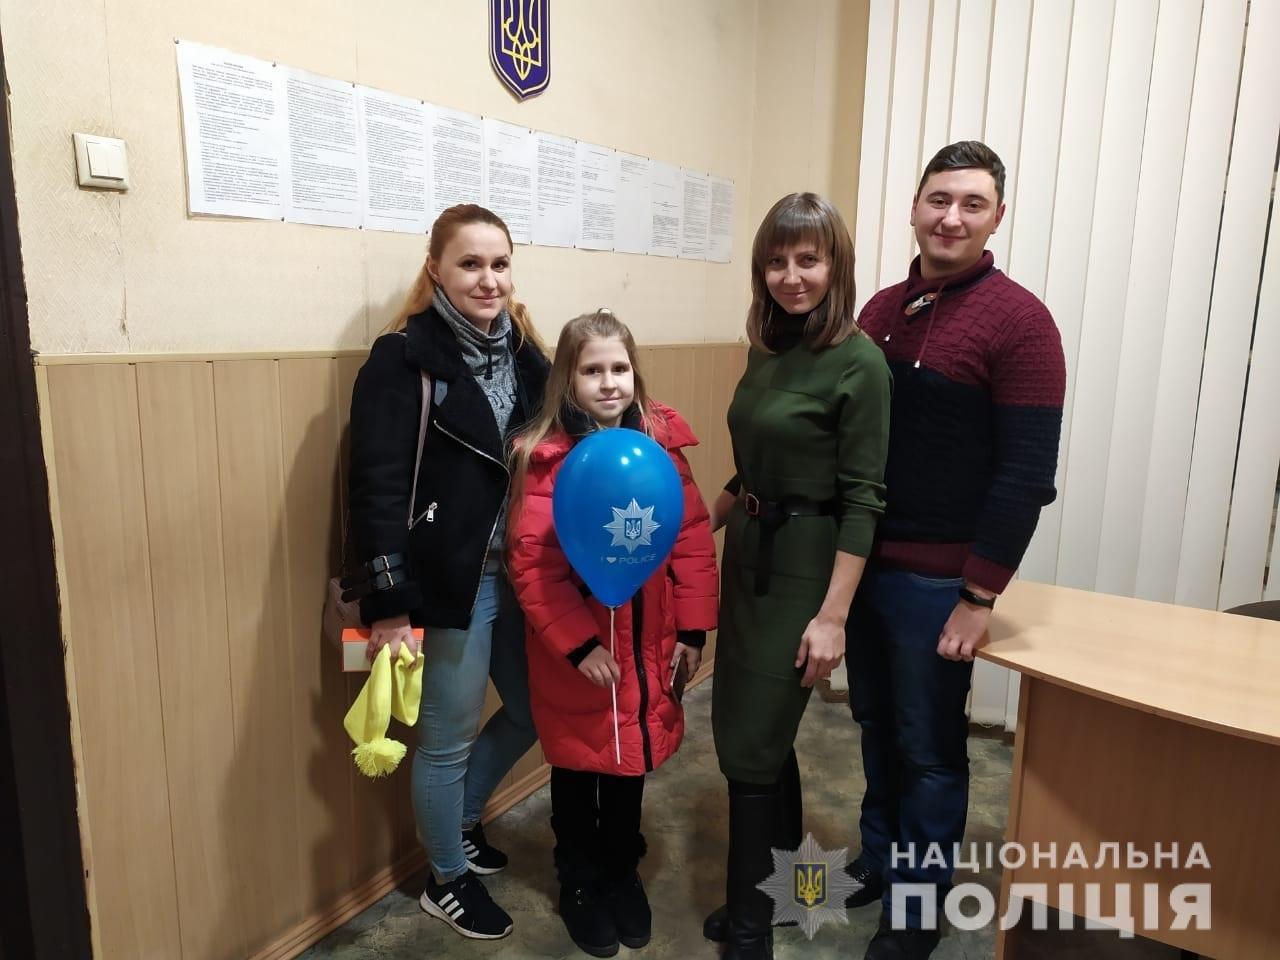 На Днепропетровщине мужчина ограбил 8-летнюю школьницу, - ФОТО, фото-1